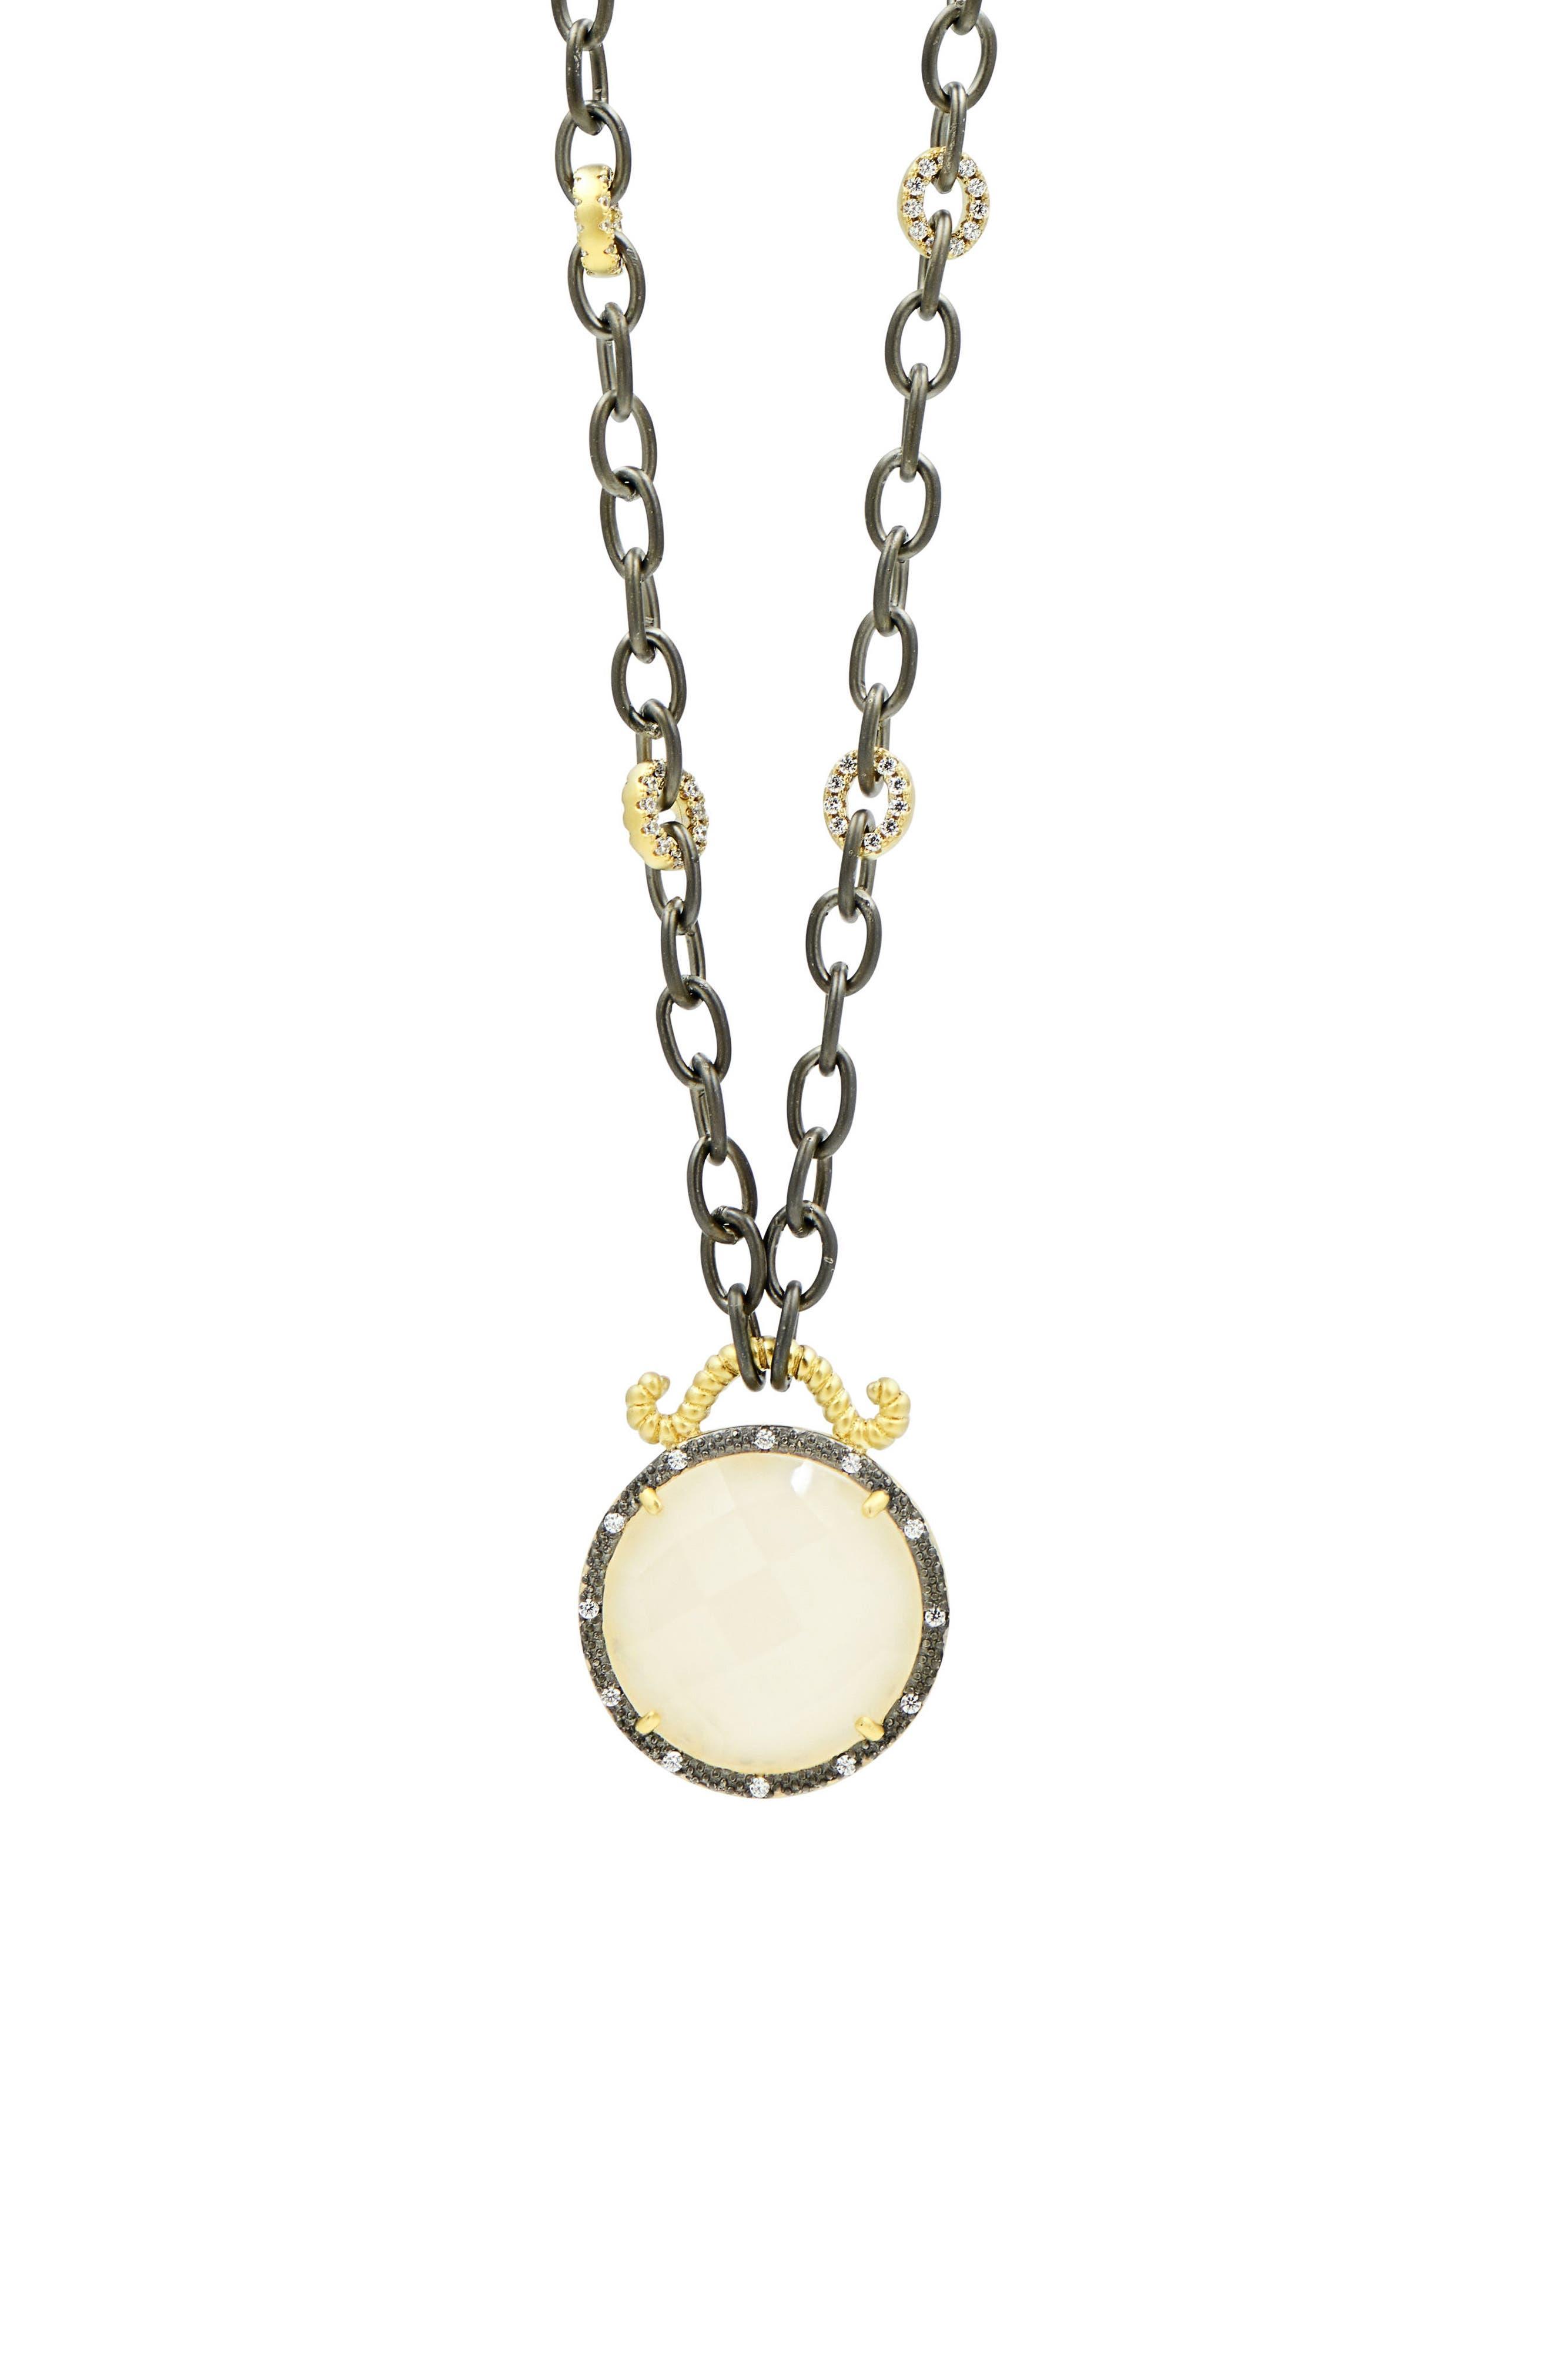 Gilded Cable Reversible Pendant Necklace,                             Alternate thumbnail 6, color,                             Black/ Gold